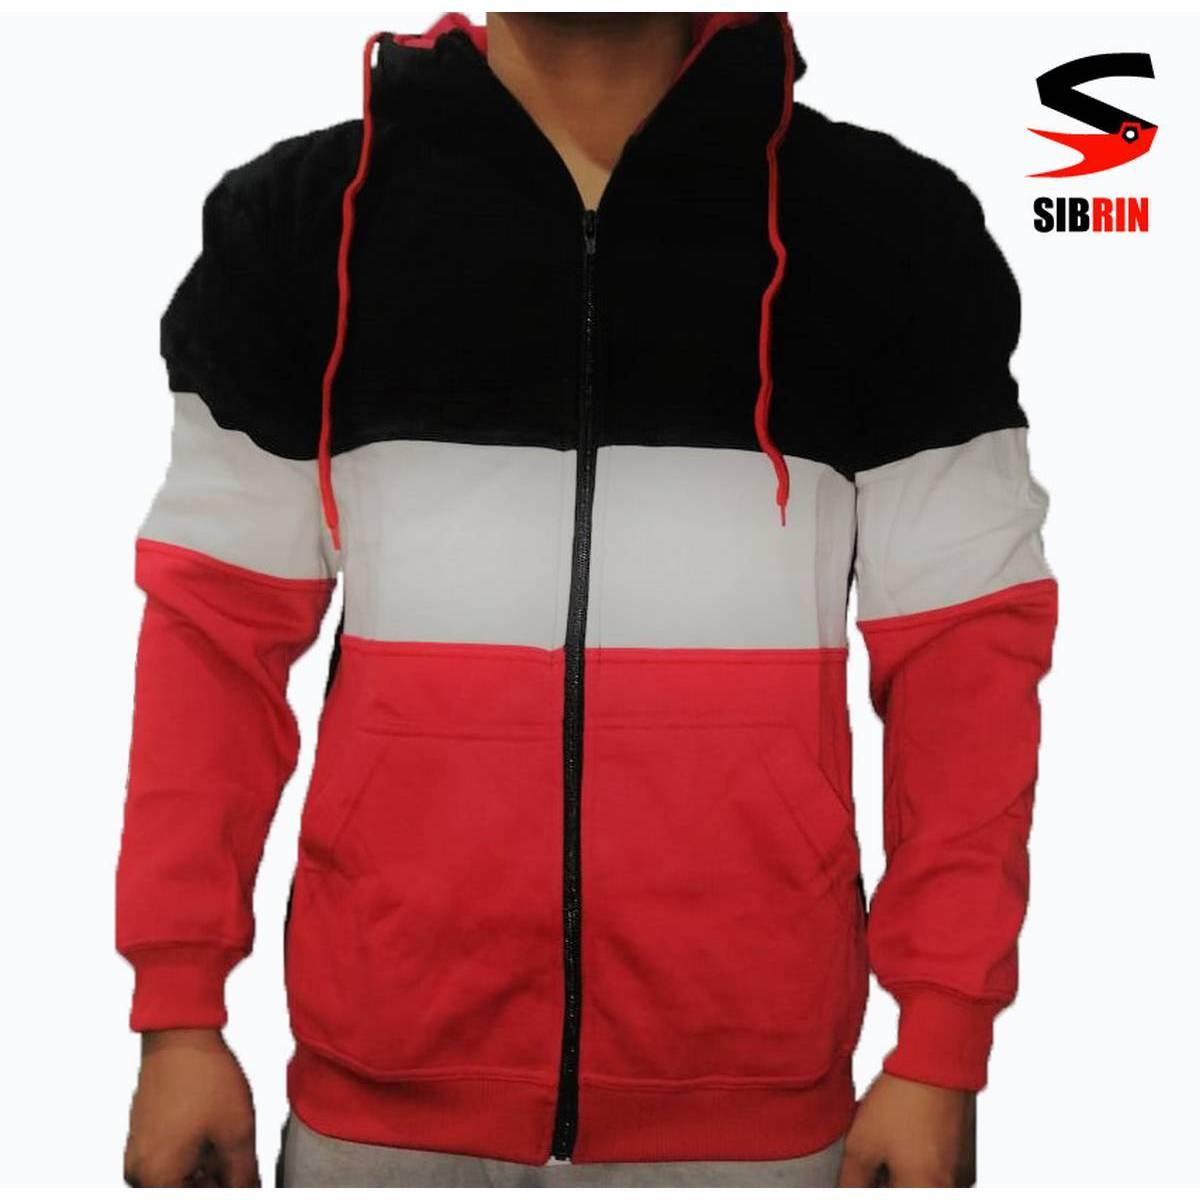 SIBRIN New Stylish Winter Fleece Zipper HOODIE for Men RED & BLACK